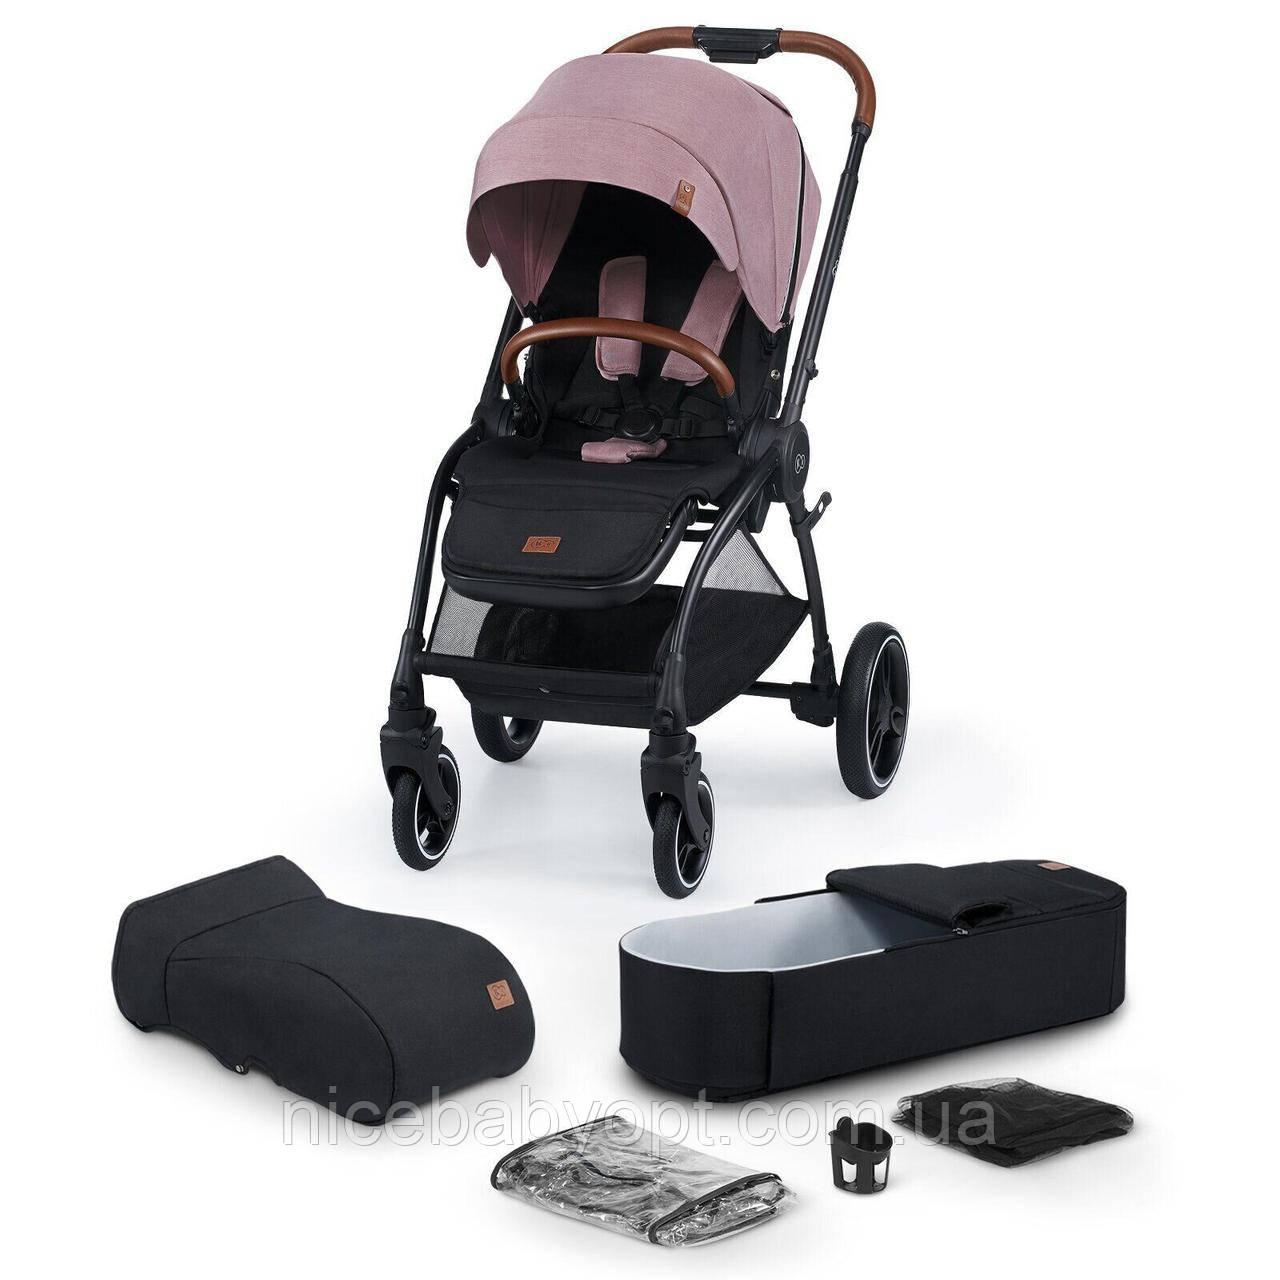 Універсальна коляска 2 в 1 Kinderkraft Evolution Cocoon Marvelous Pink